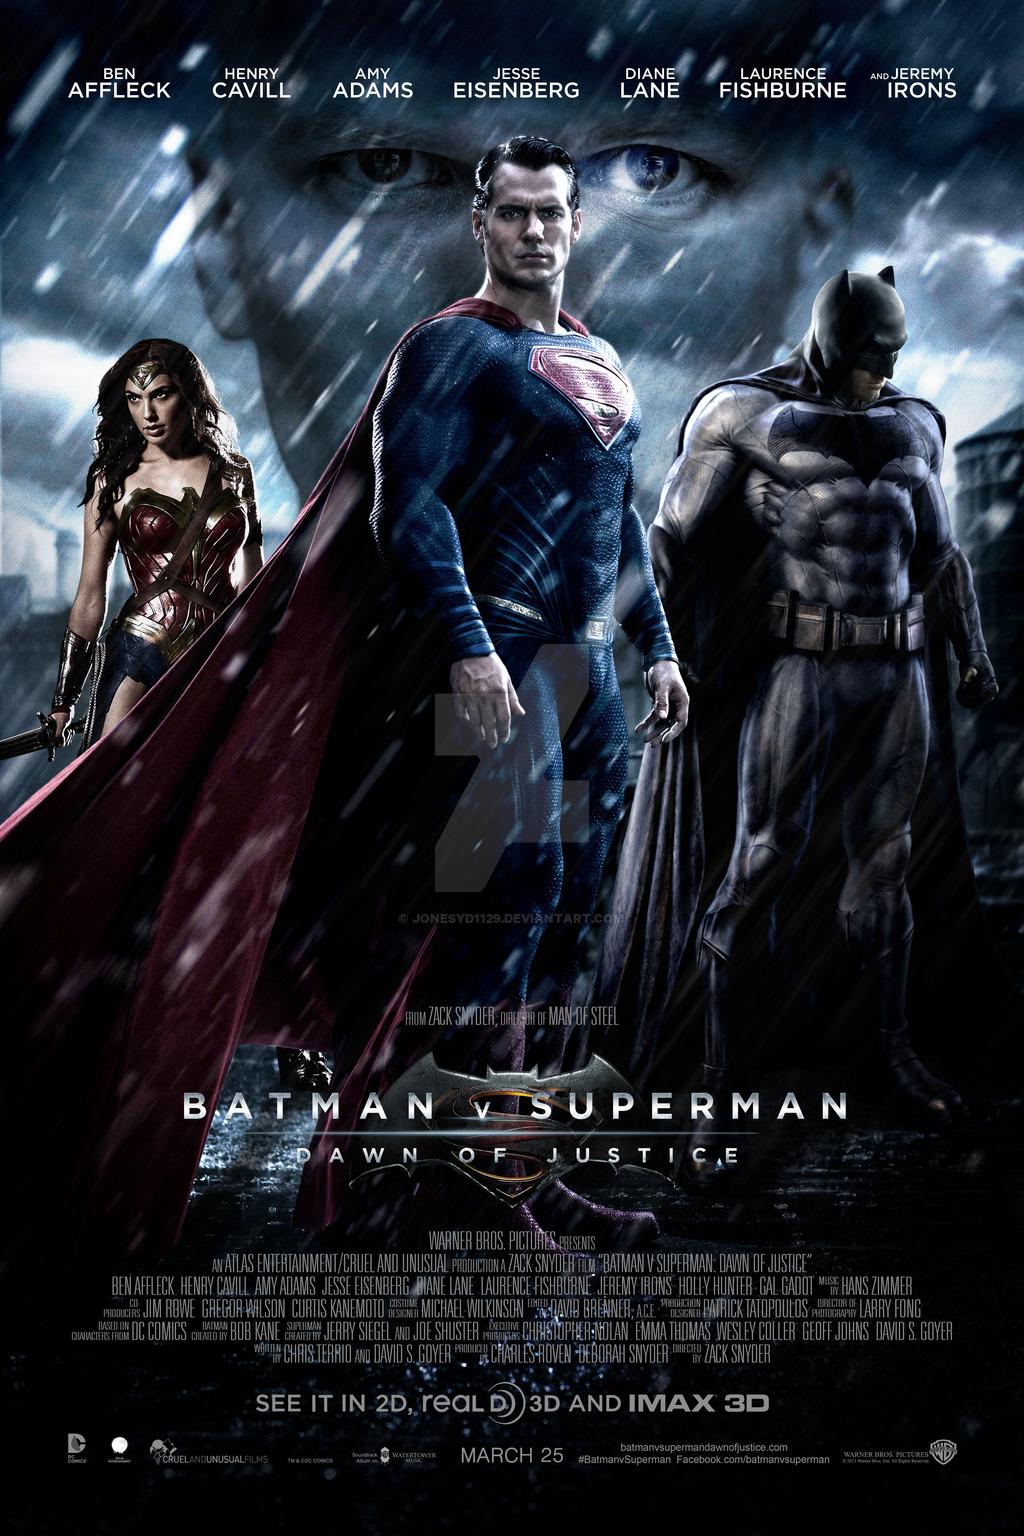 batman vs superman full movie free online streaming